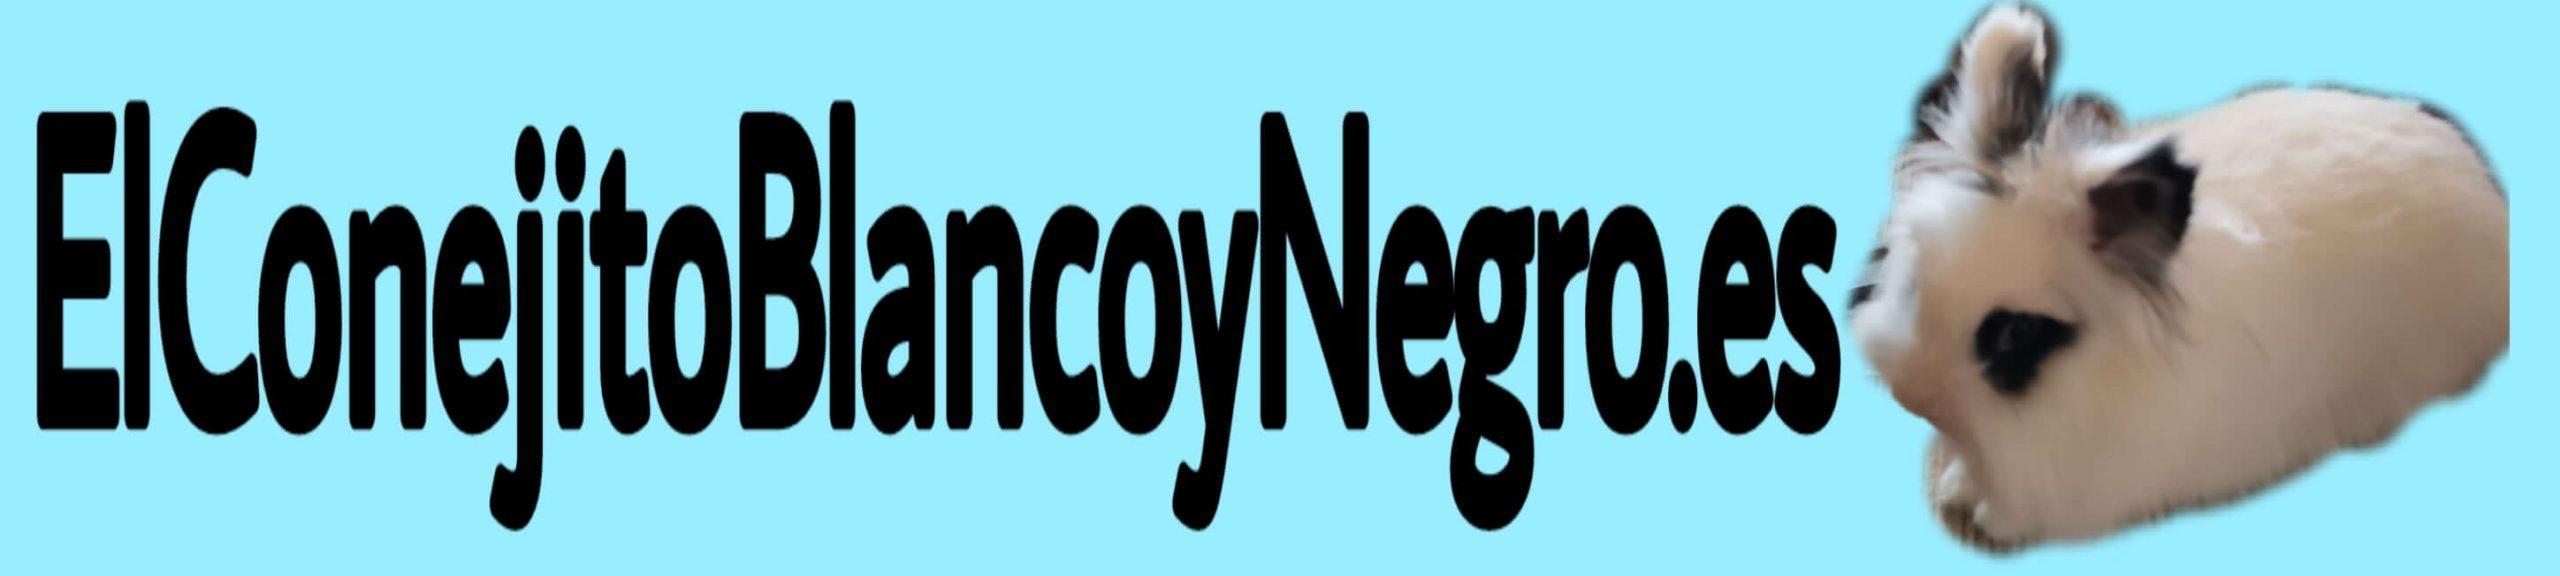 ElConejitoBlancoyNegro